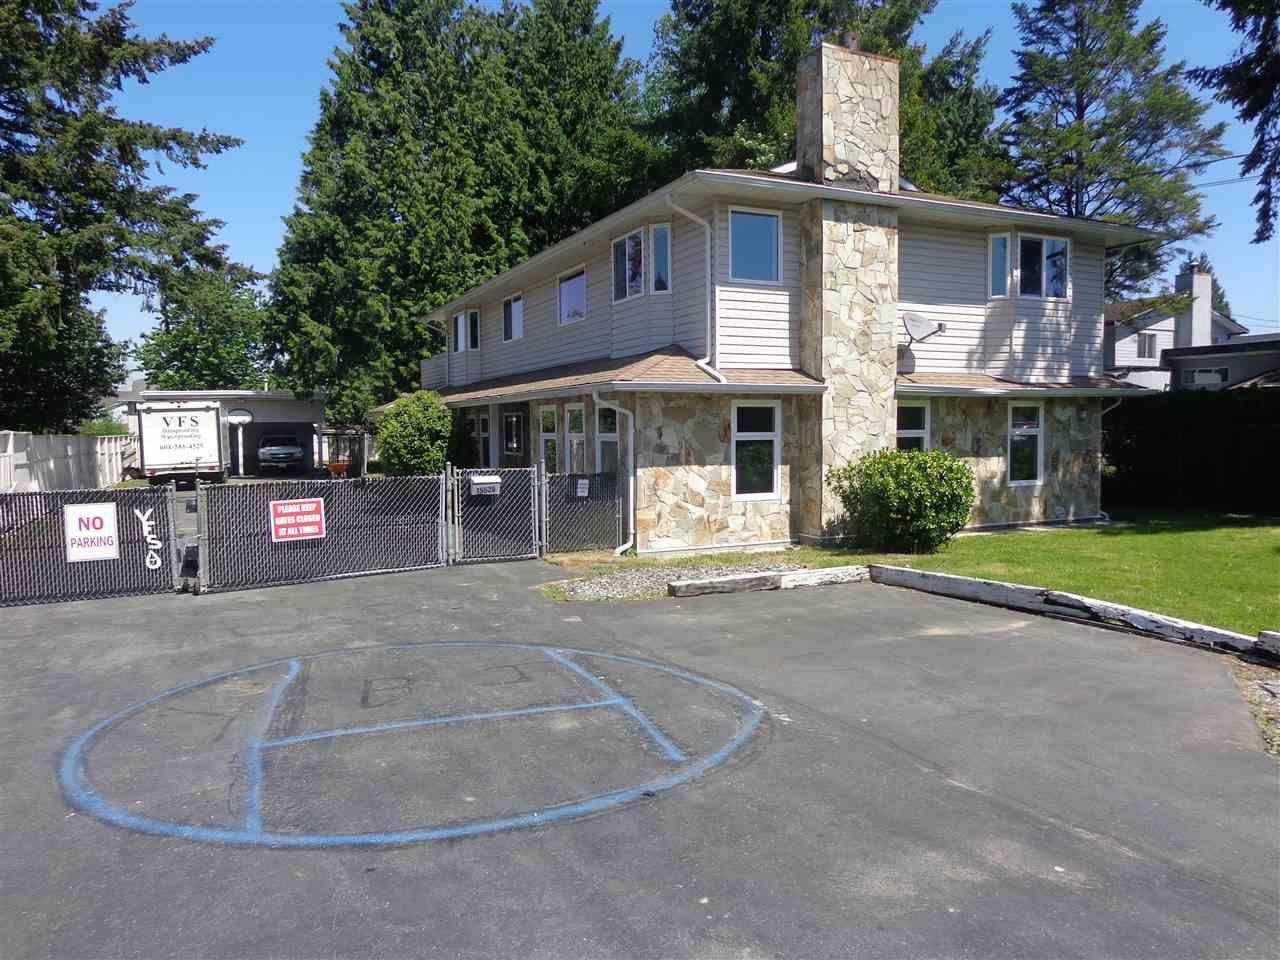 Main Photo: 15525 92 Avenue in Surrey: Fleetwood Tynehead House for sale : MLS®# R2268789